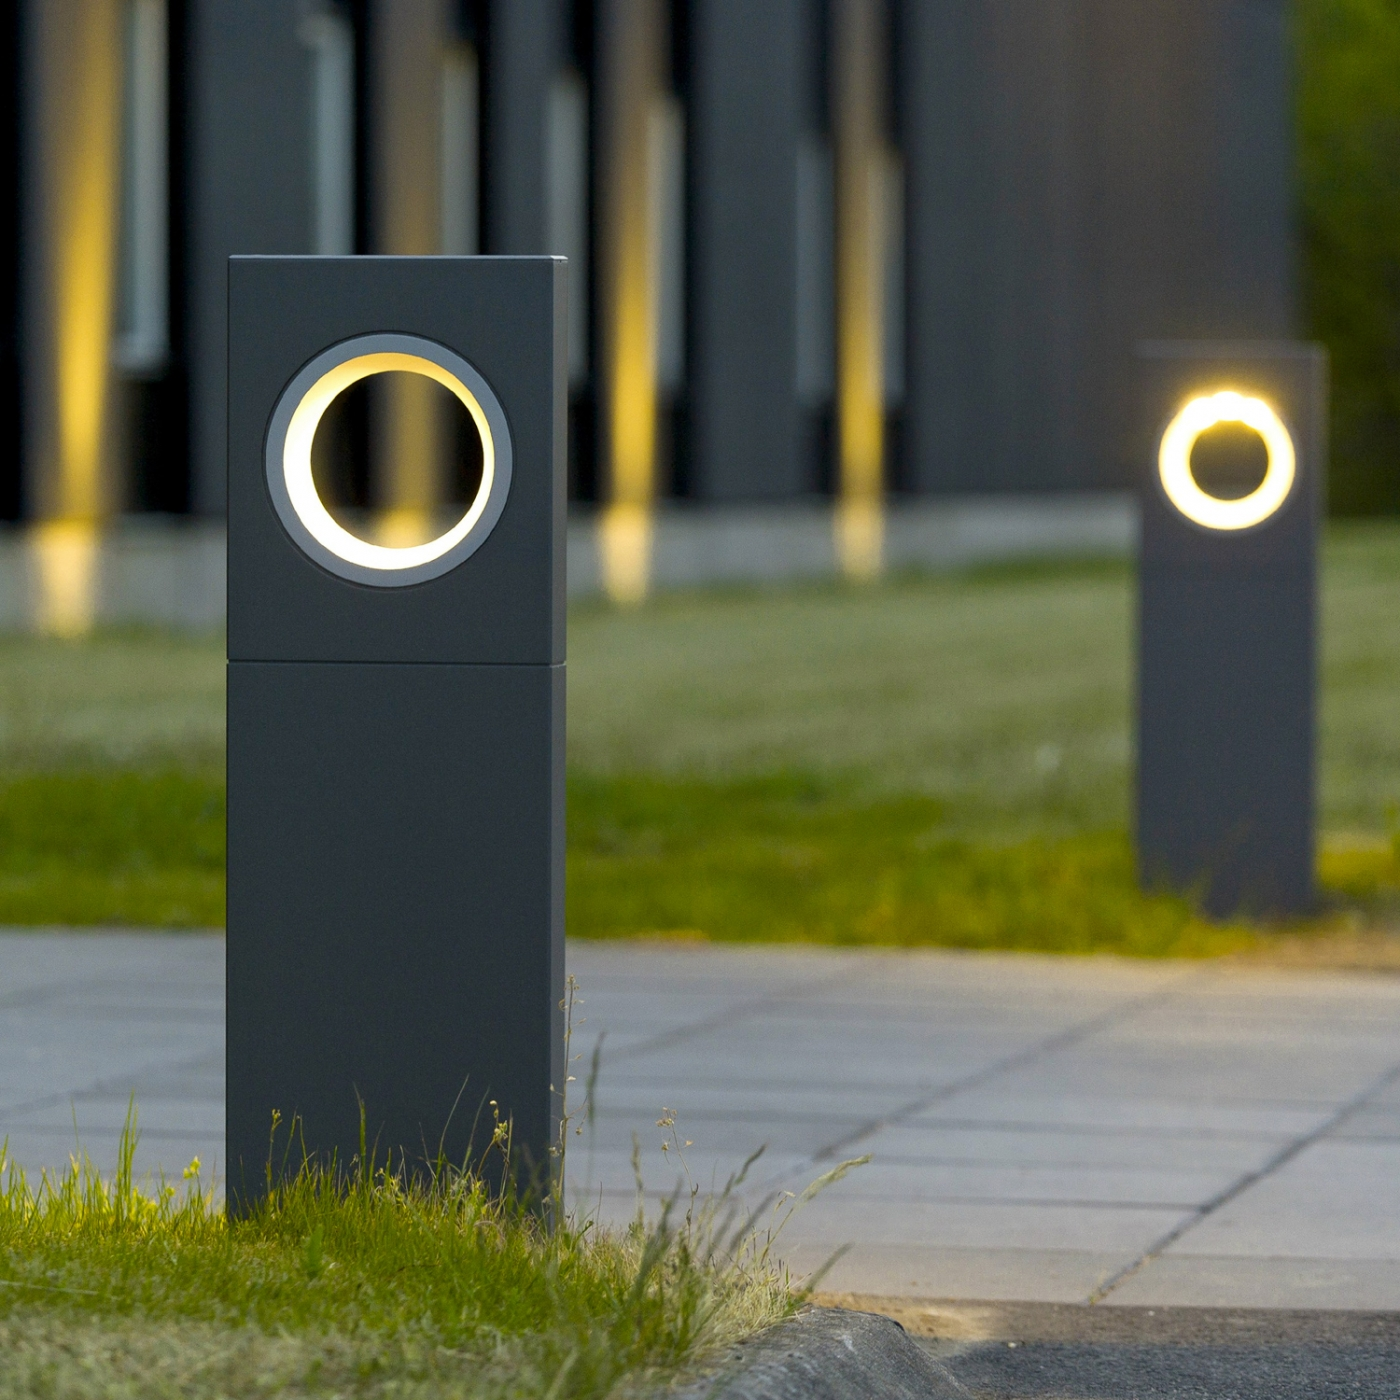 Moon paletto platek light s r l lampade da esterno - Lampade esterno ikea ...